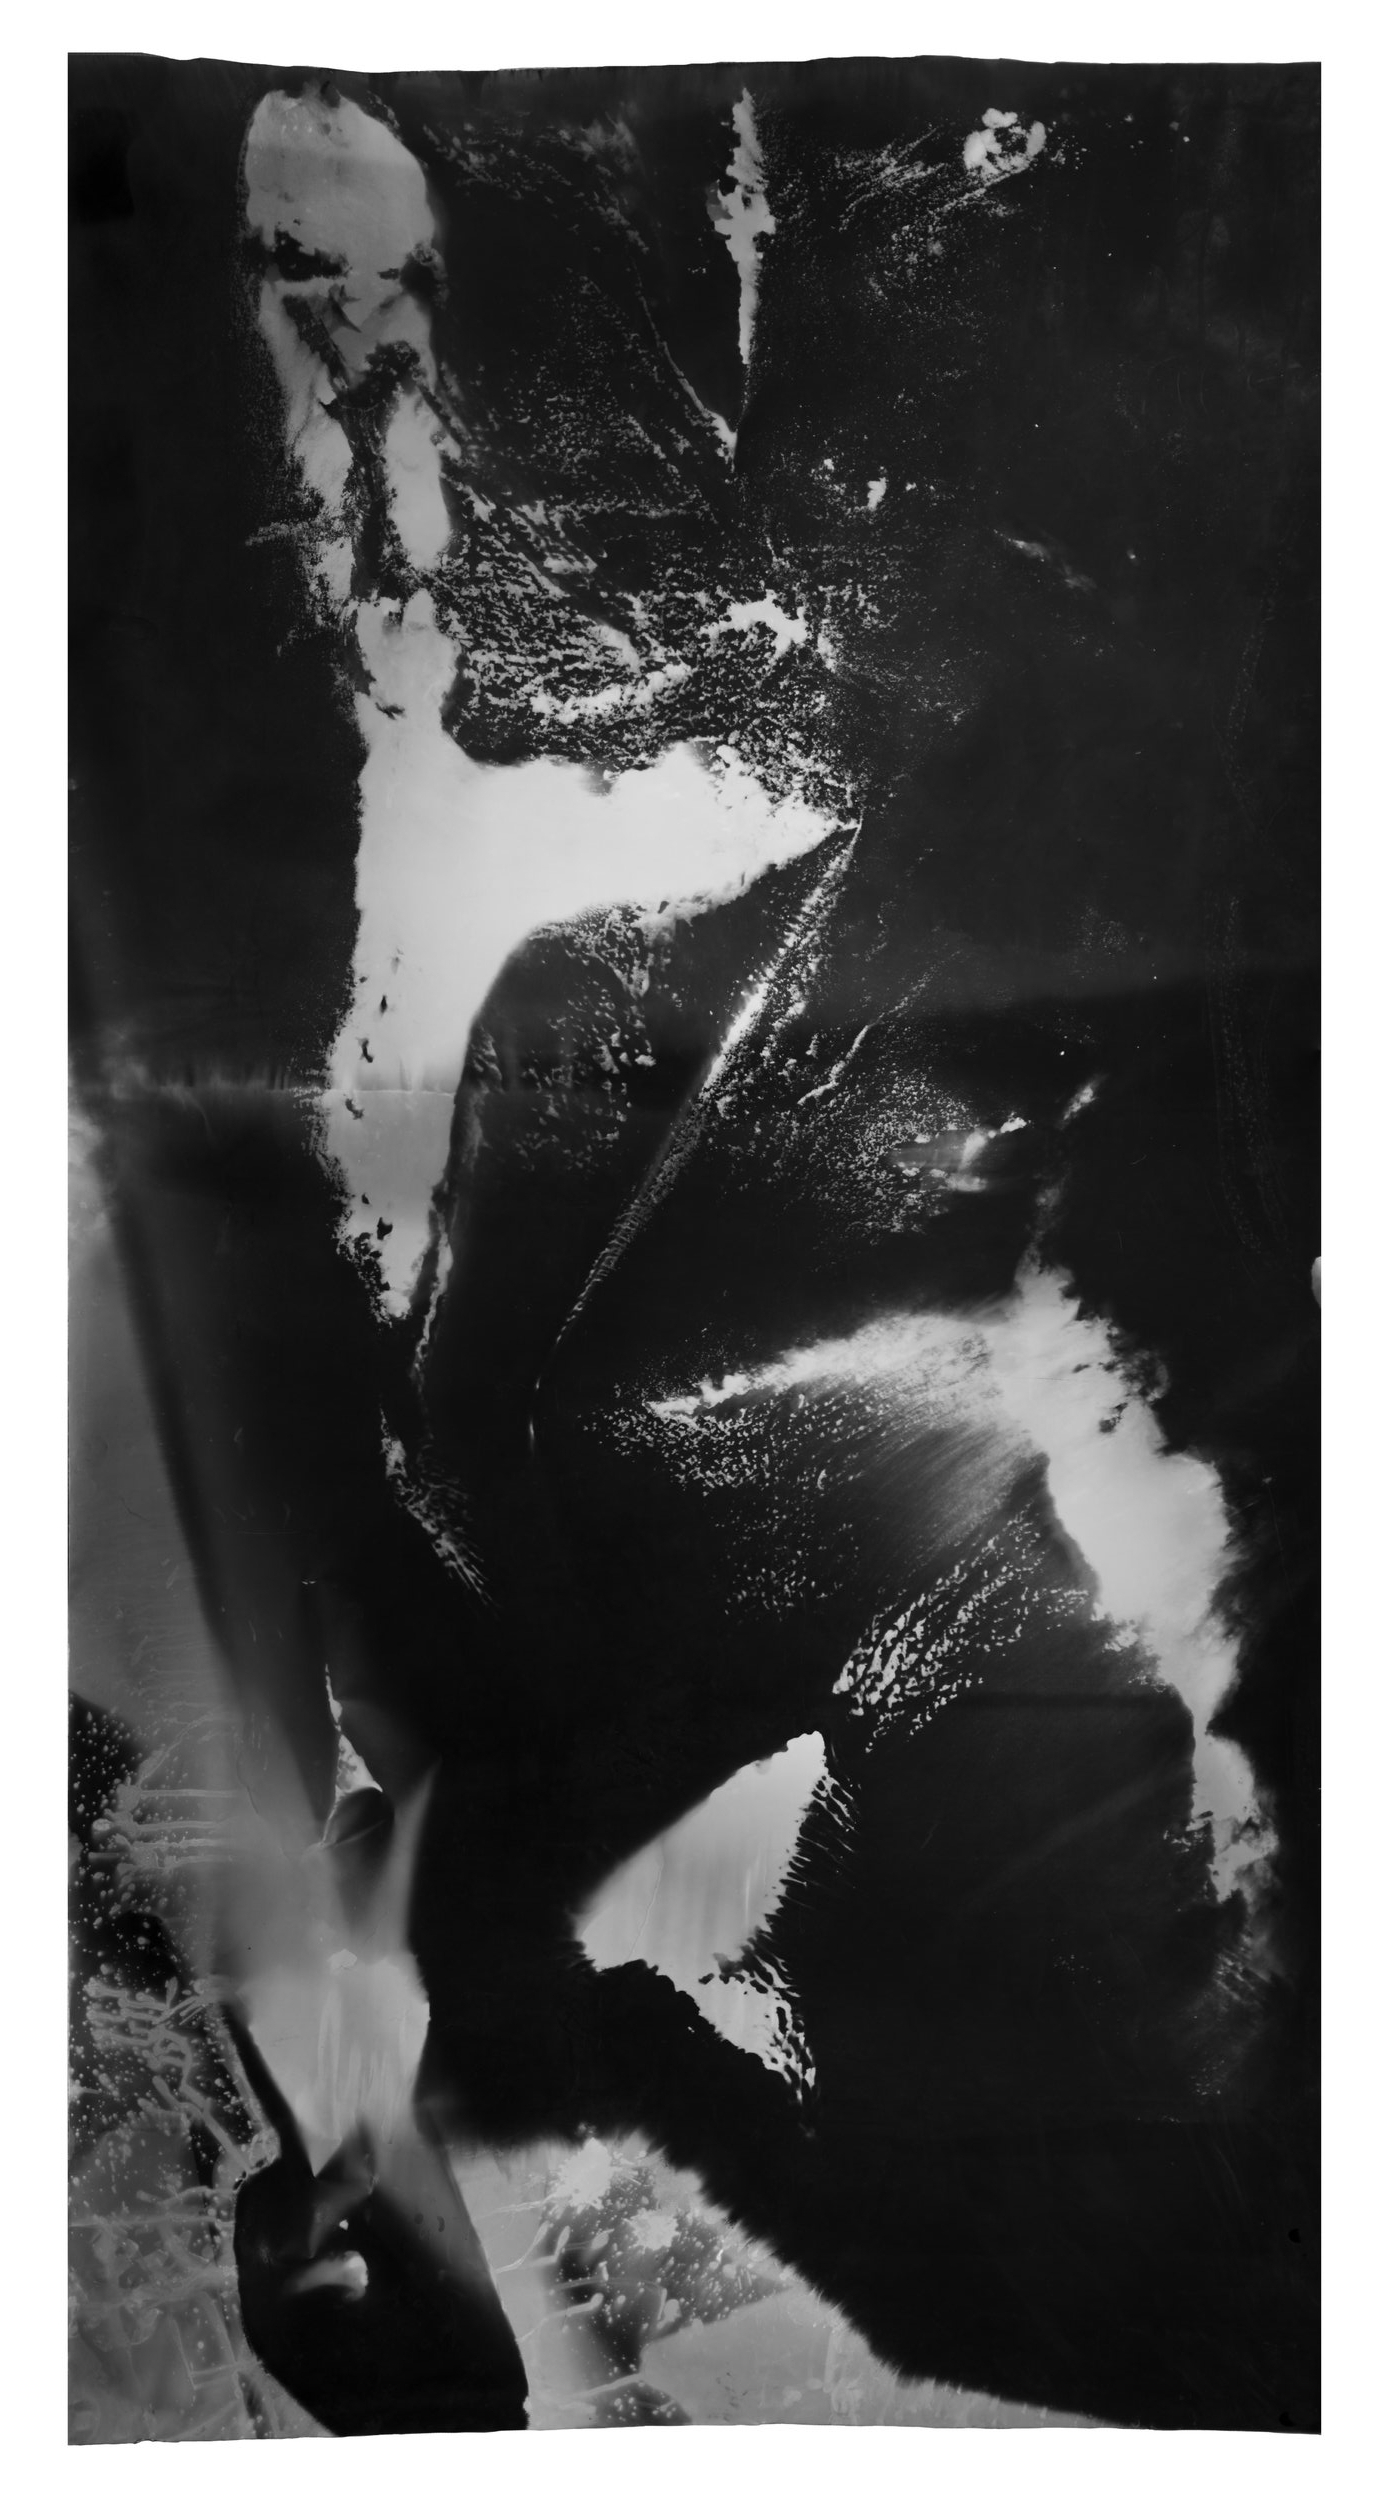 River Test , 2017, 6.83 feet x 3.5 feet, Silver Gelatin Print